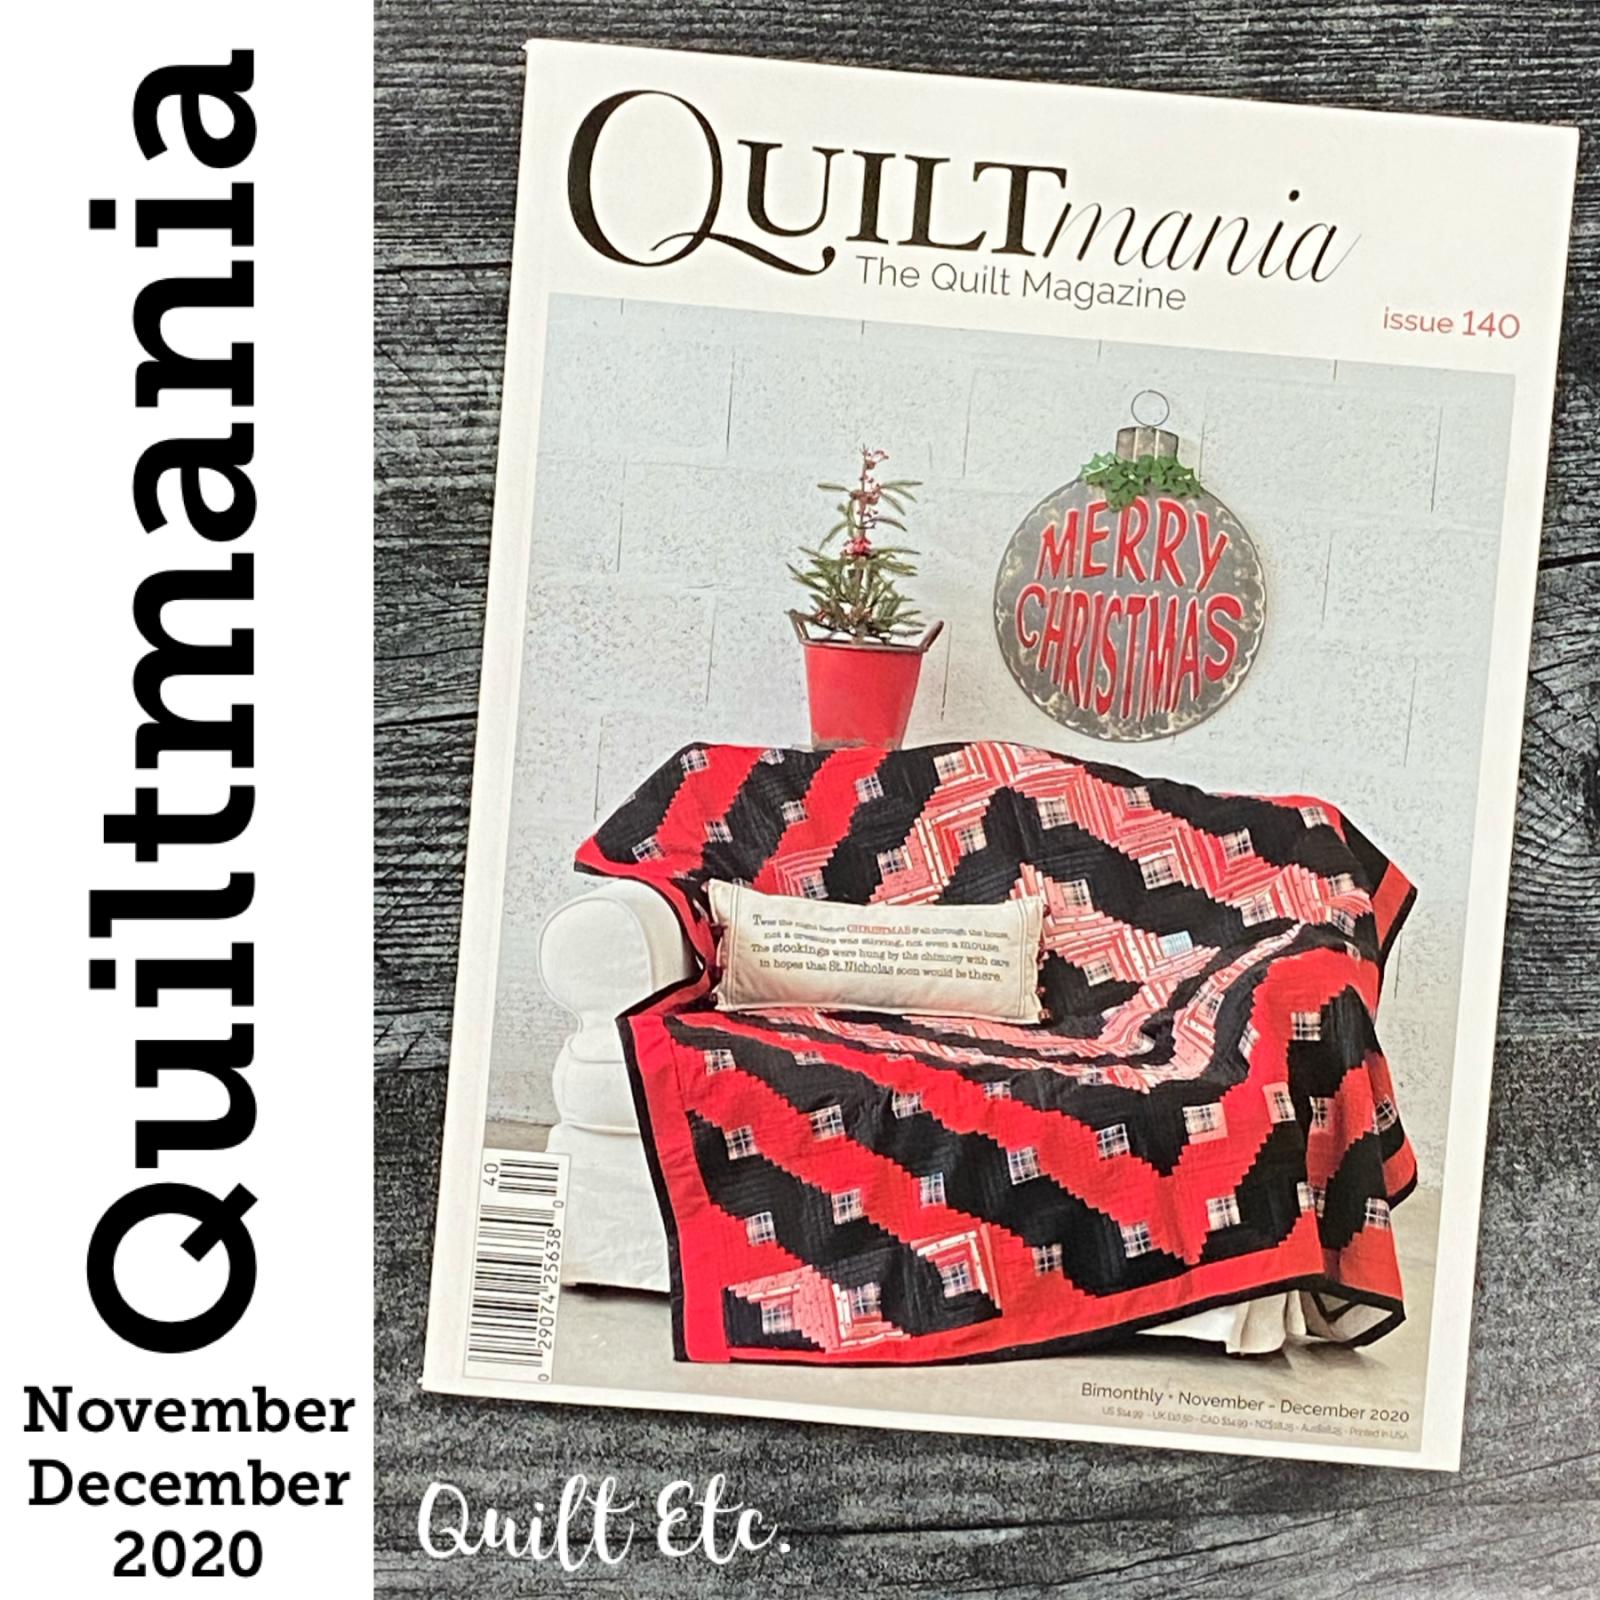 Quiltmania Magazine Issue 140 November/ December 2020